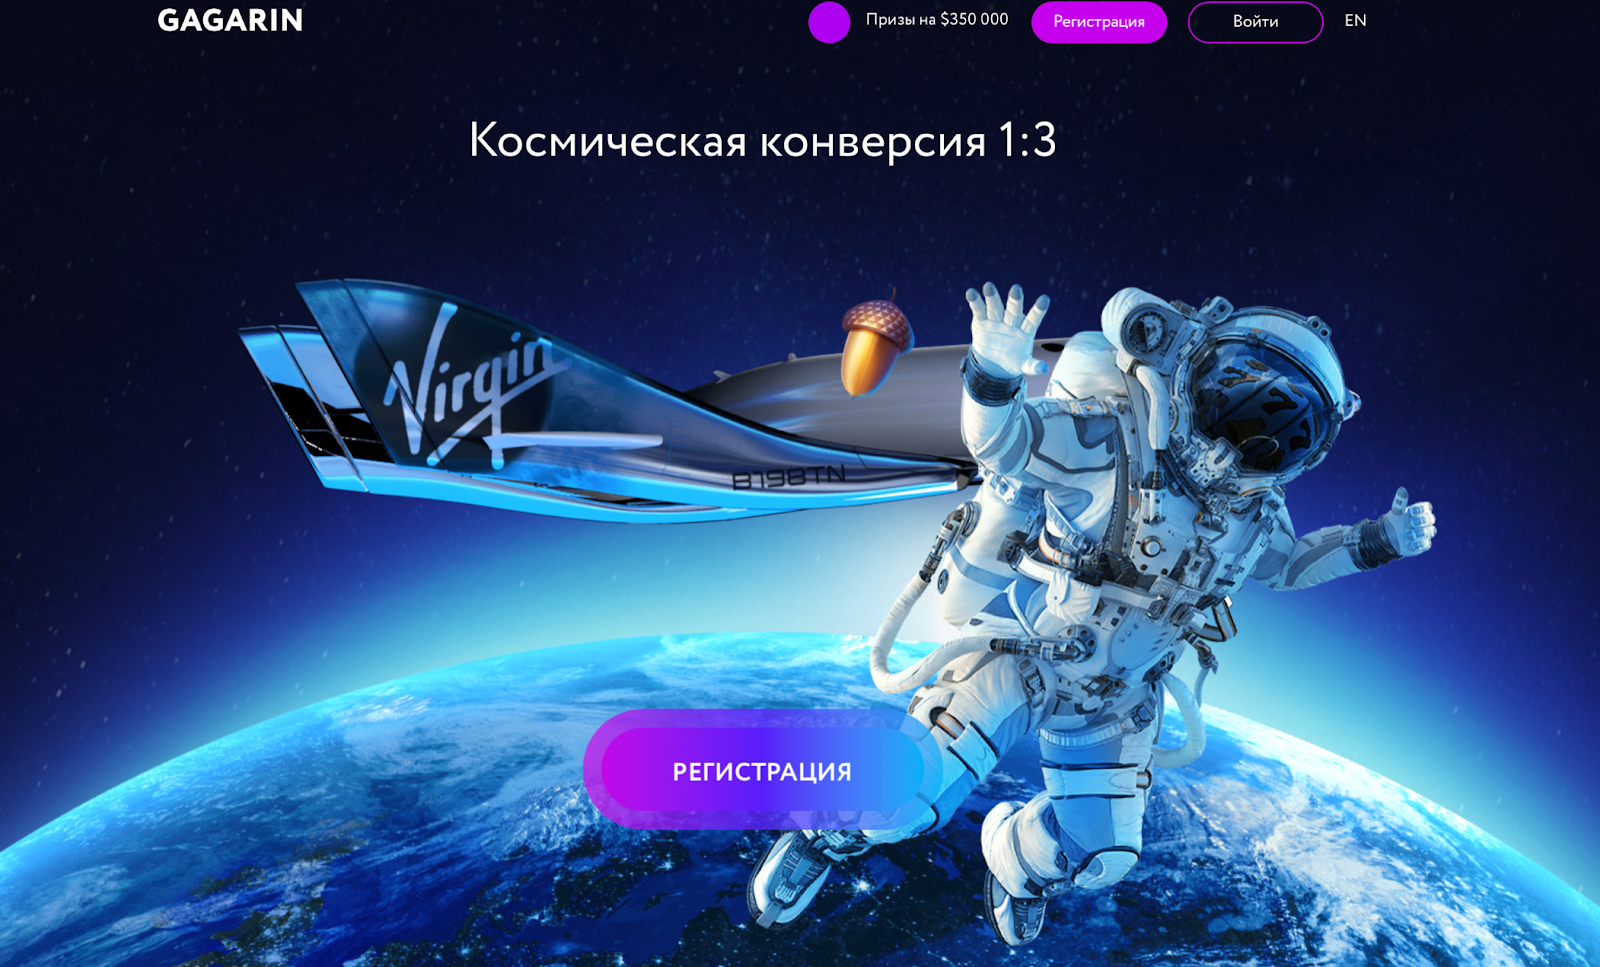 Партнерская программа Gagarin Partners